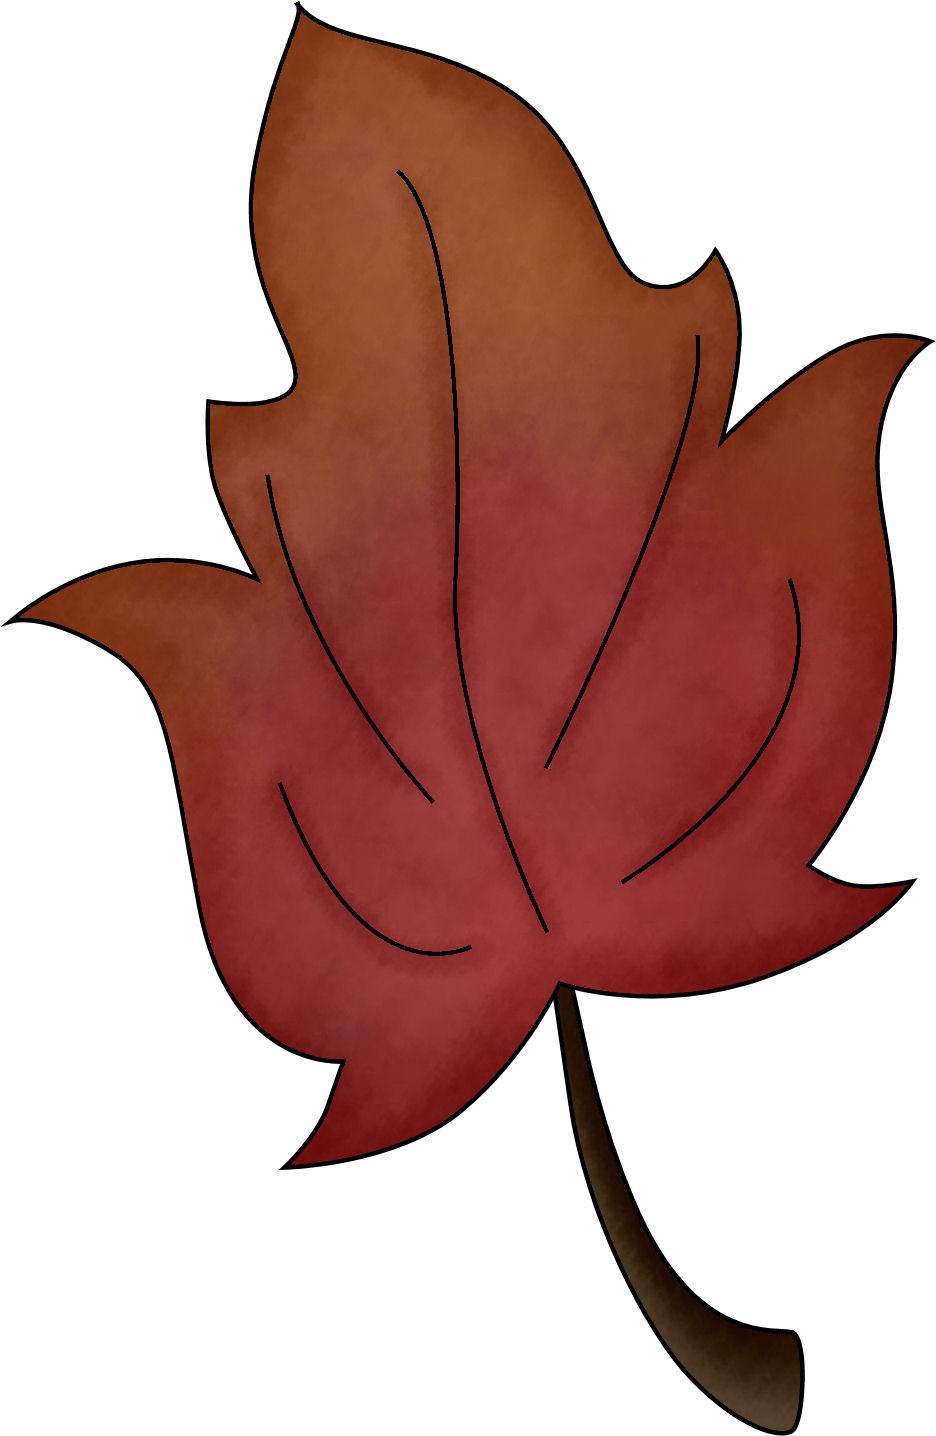 936x1436 Autumn Leaves Clipart